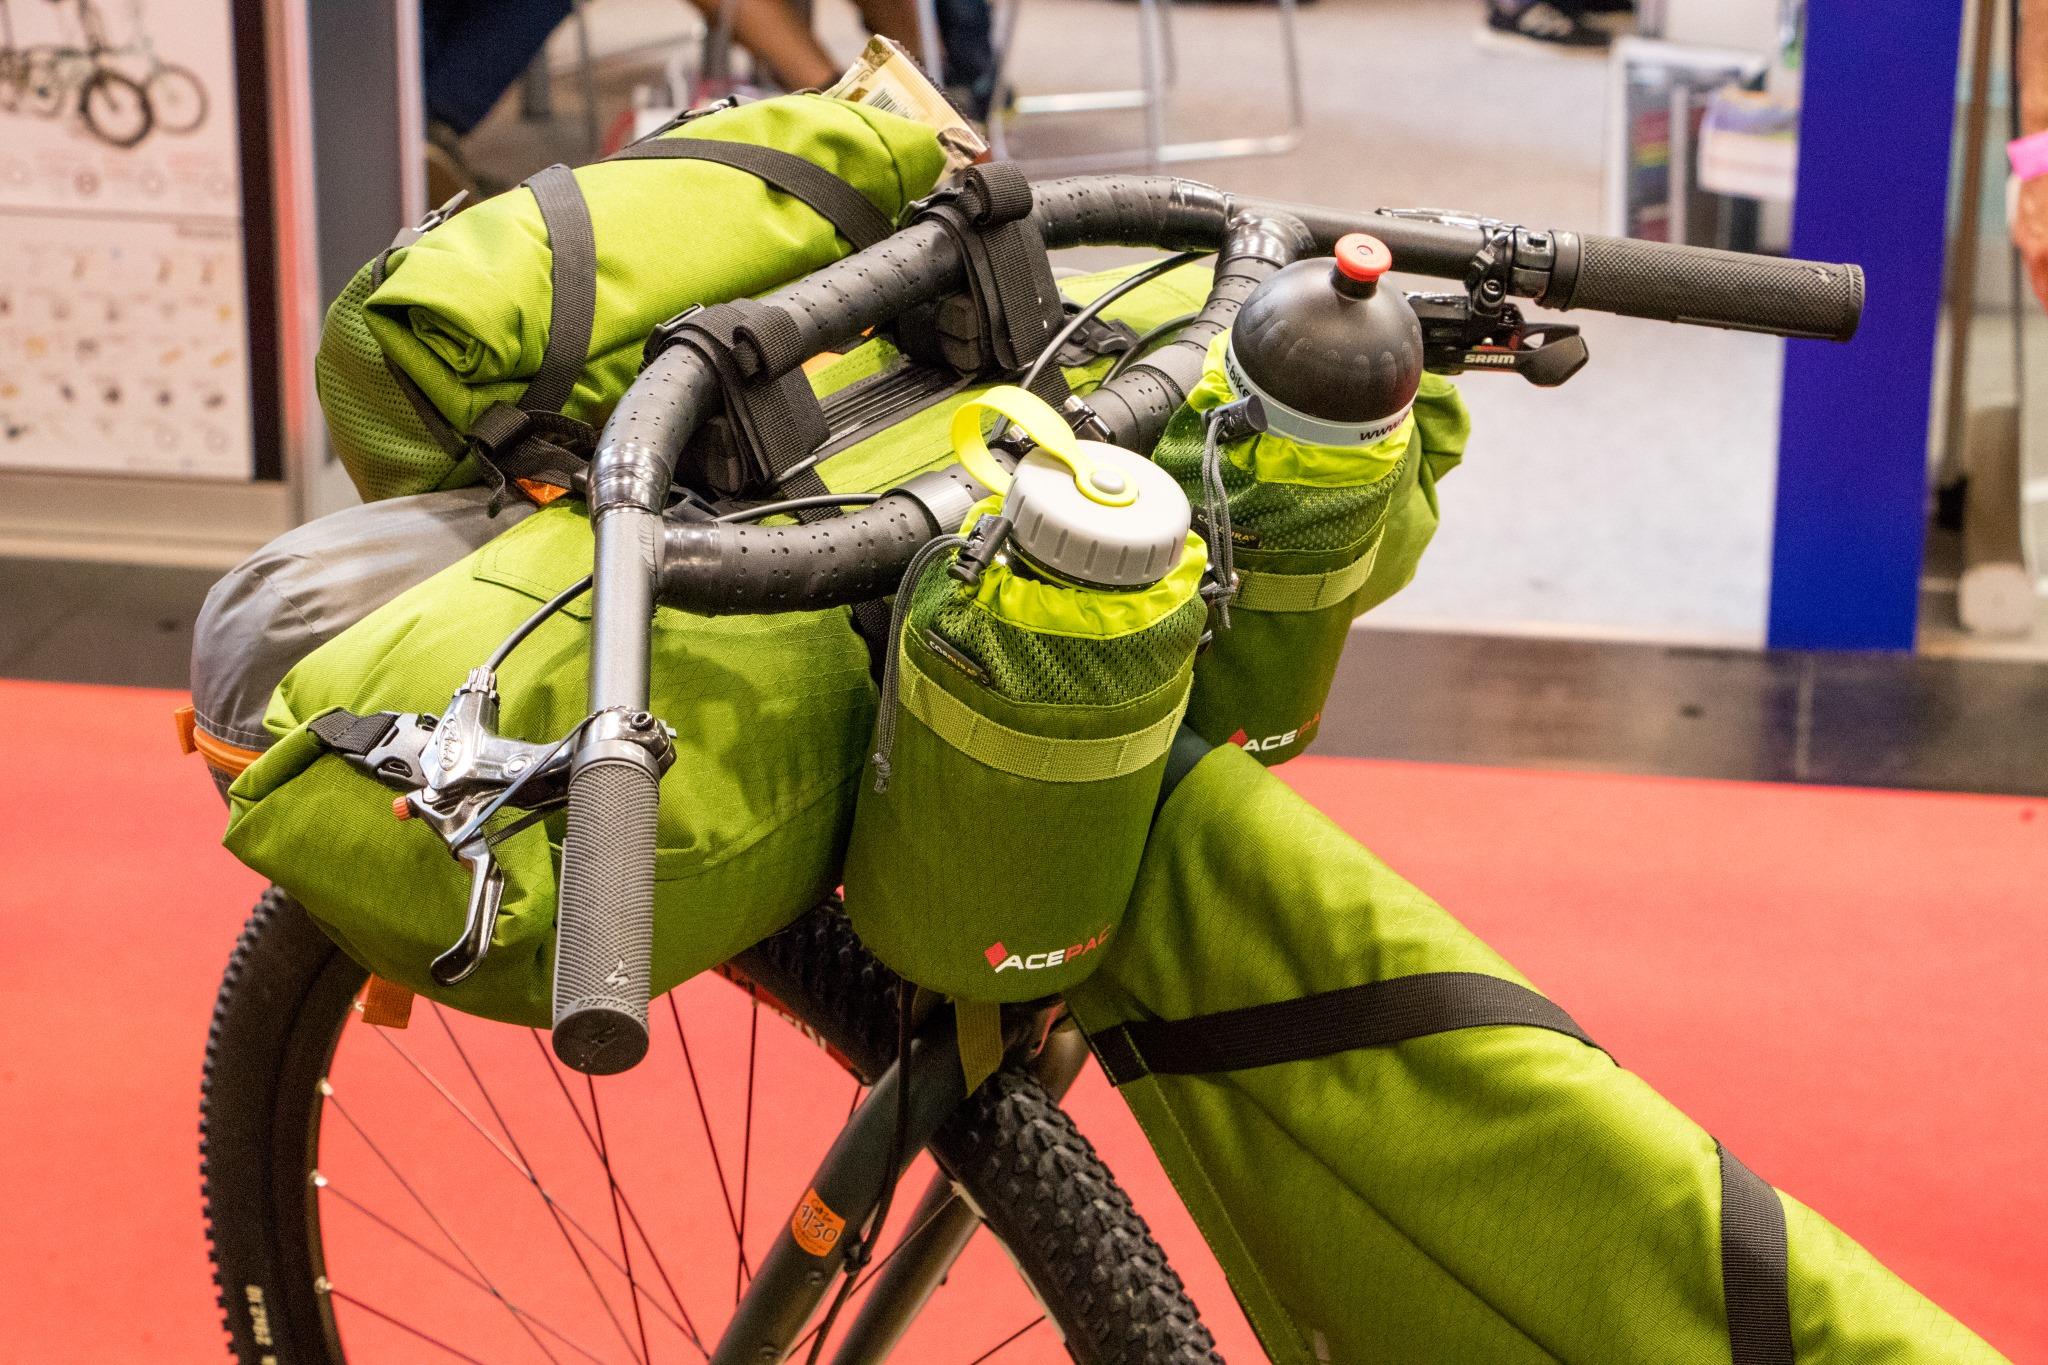 acepack_bikepacking004